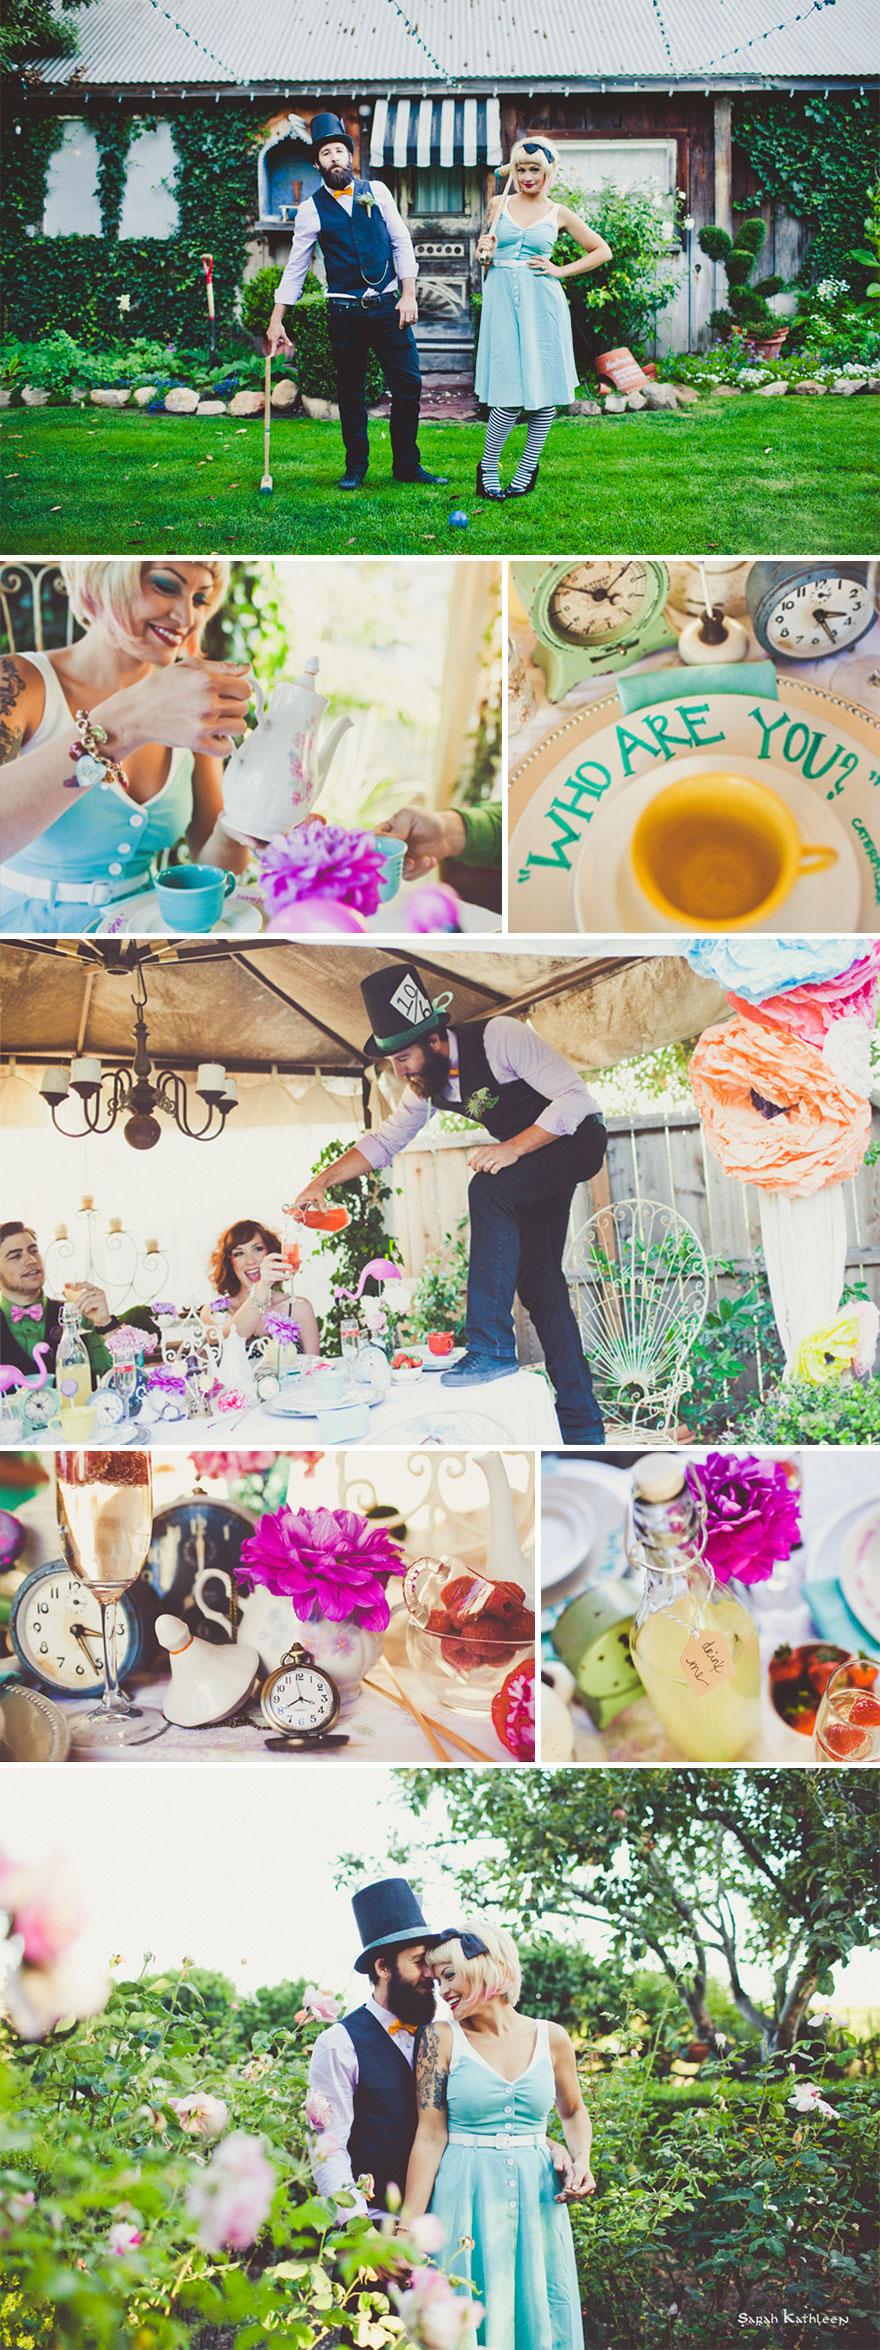 foto-matrimonio-tematico-immagini-03